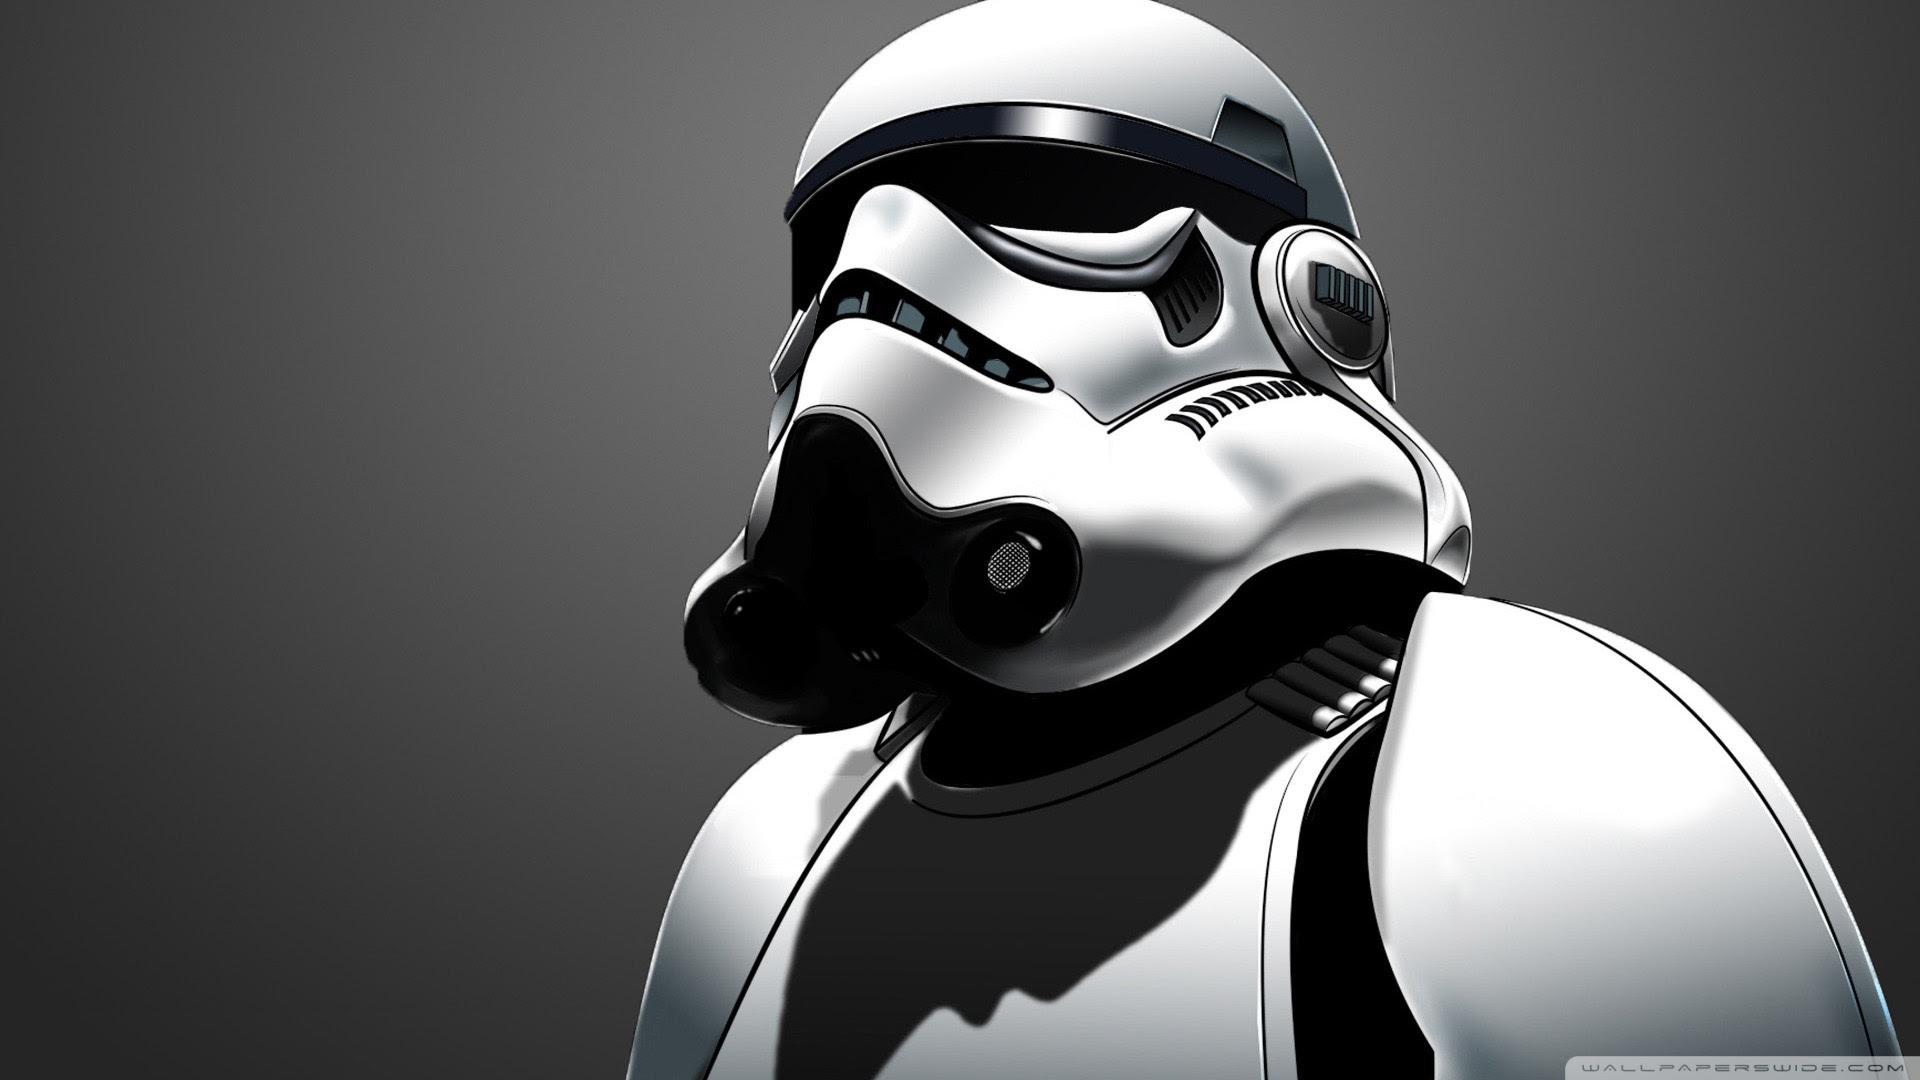 Star Wars Storm Trooper Uhd Desktop Wallpaper For 4k Ultra